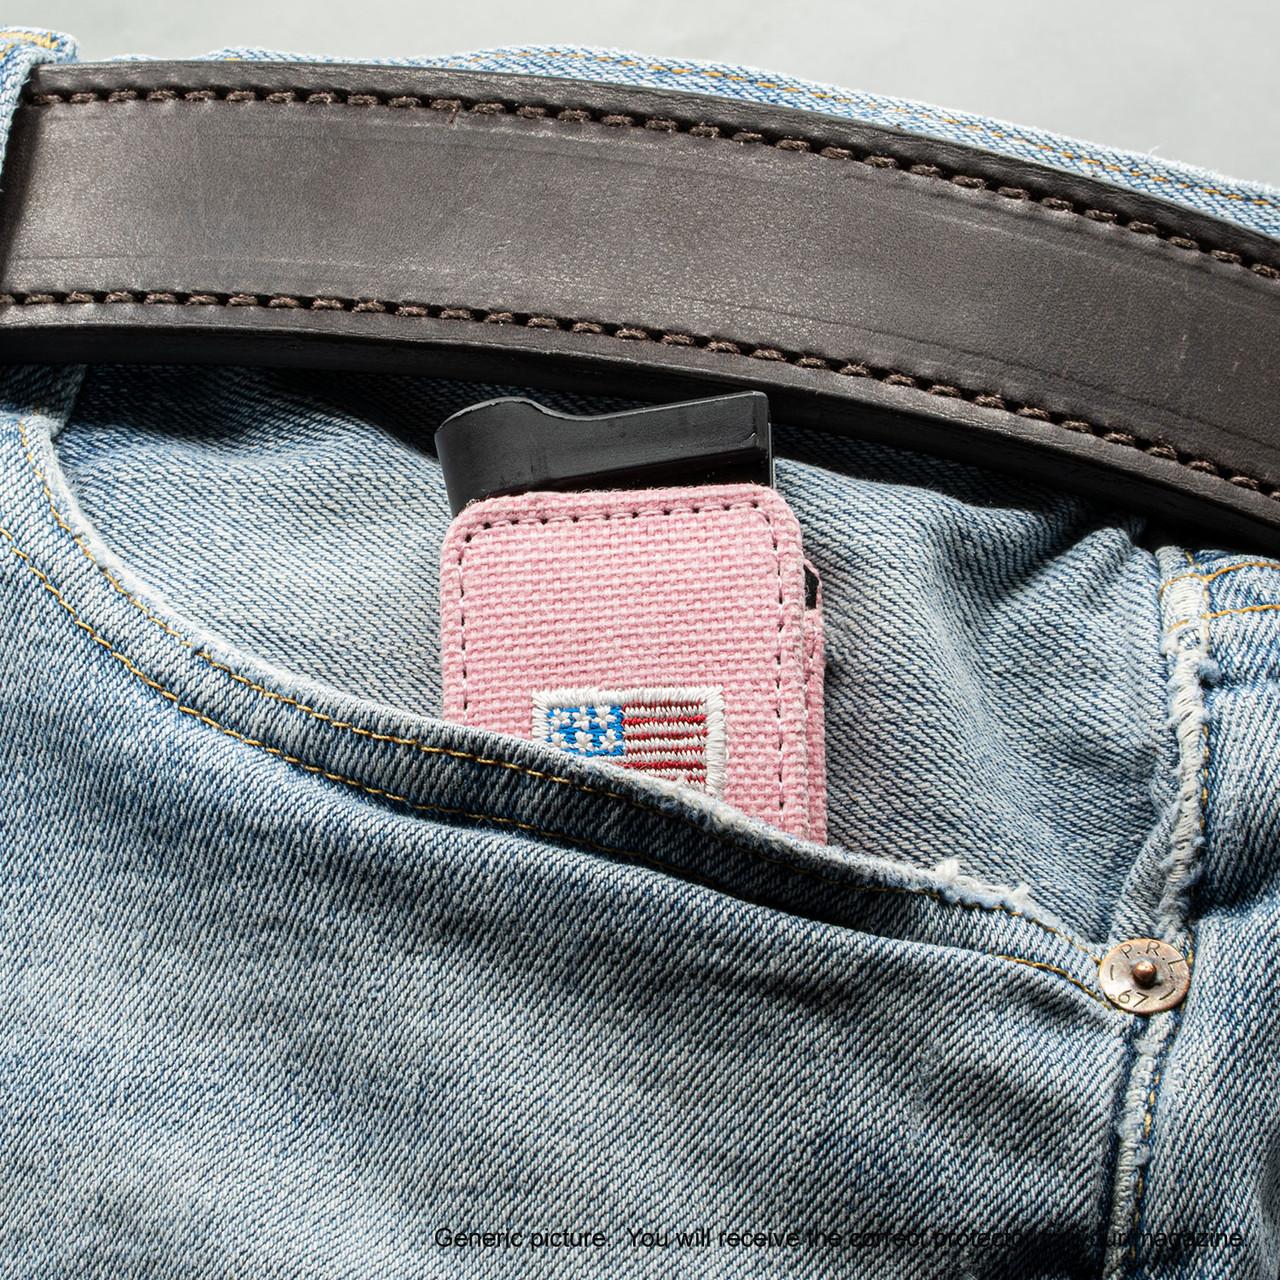 Ruger Security 9 Pink Canvas Flag Magazine Pocket Protector